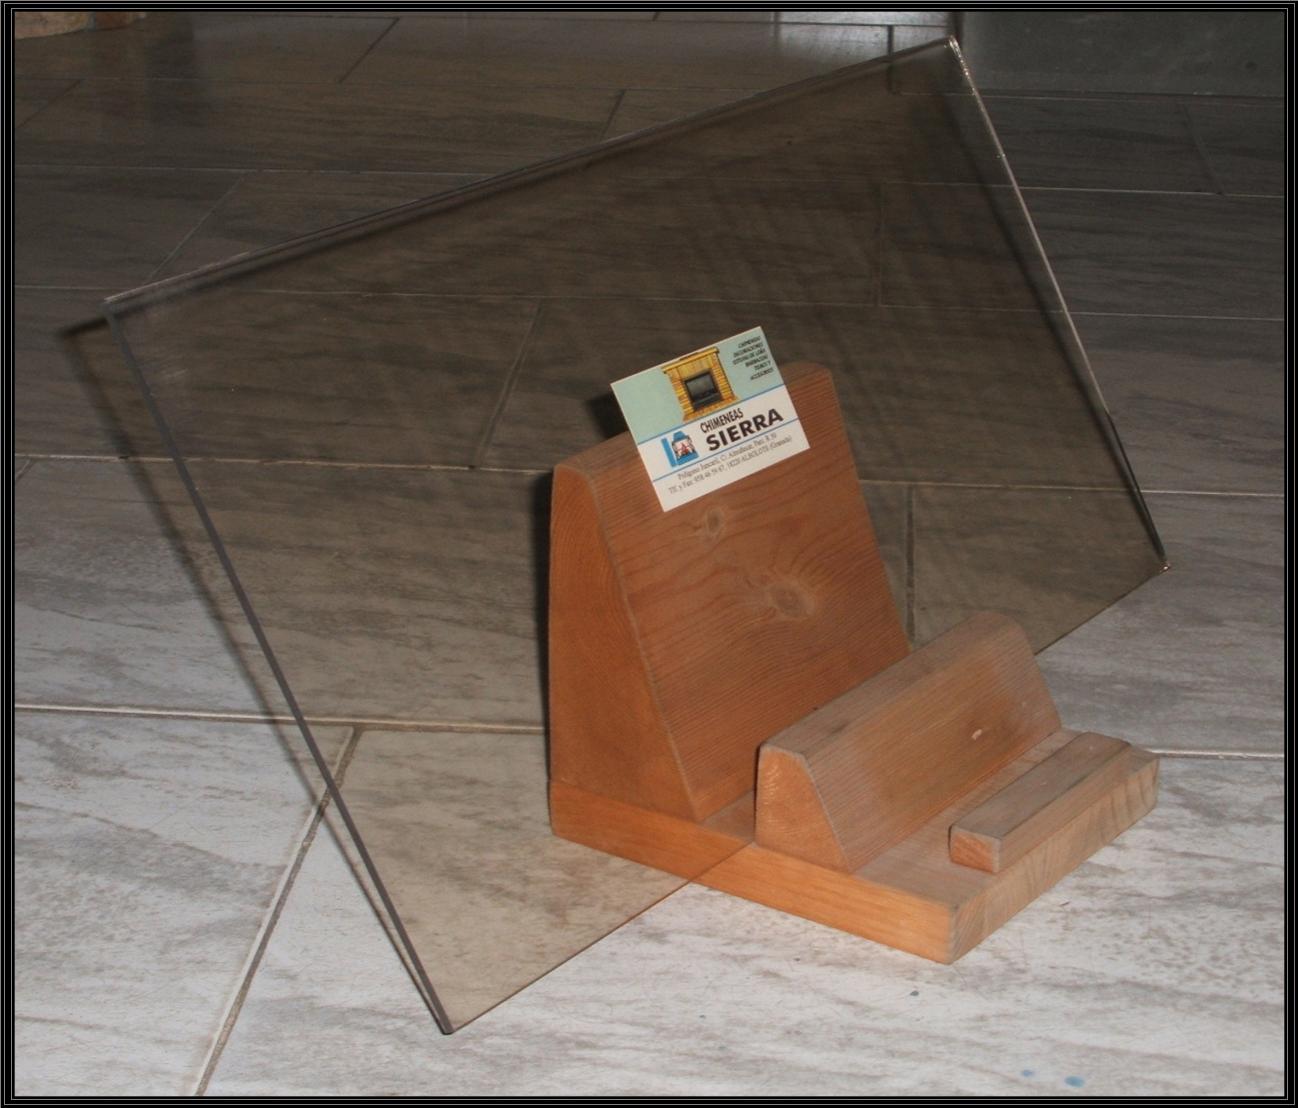 Chimeneas sierra cristales vitrocer micos - Cristal vitroceramico chimenea ...